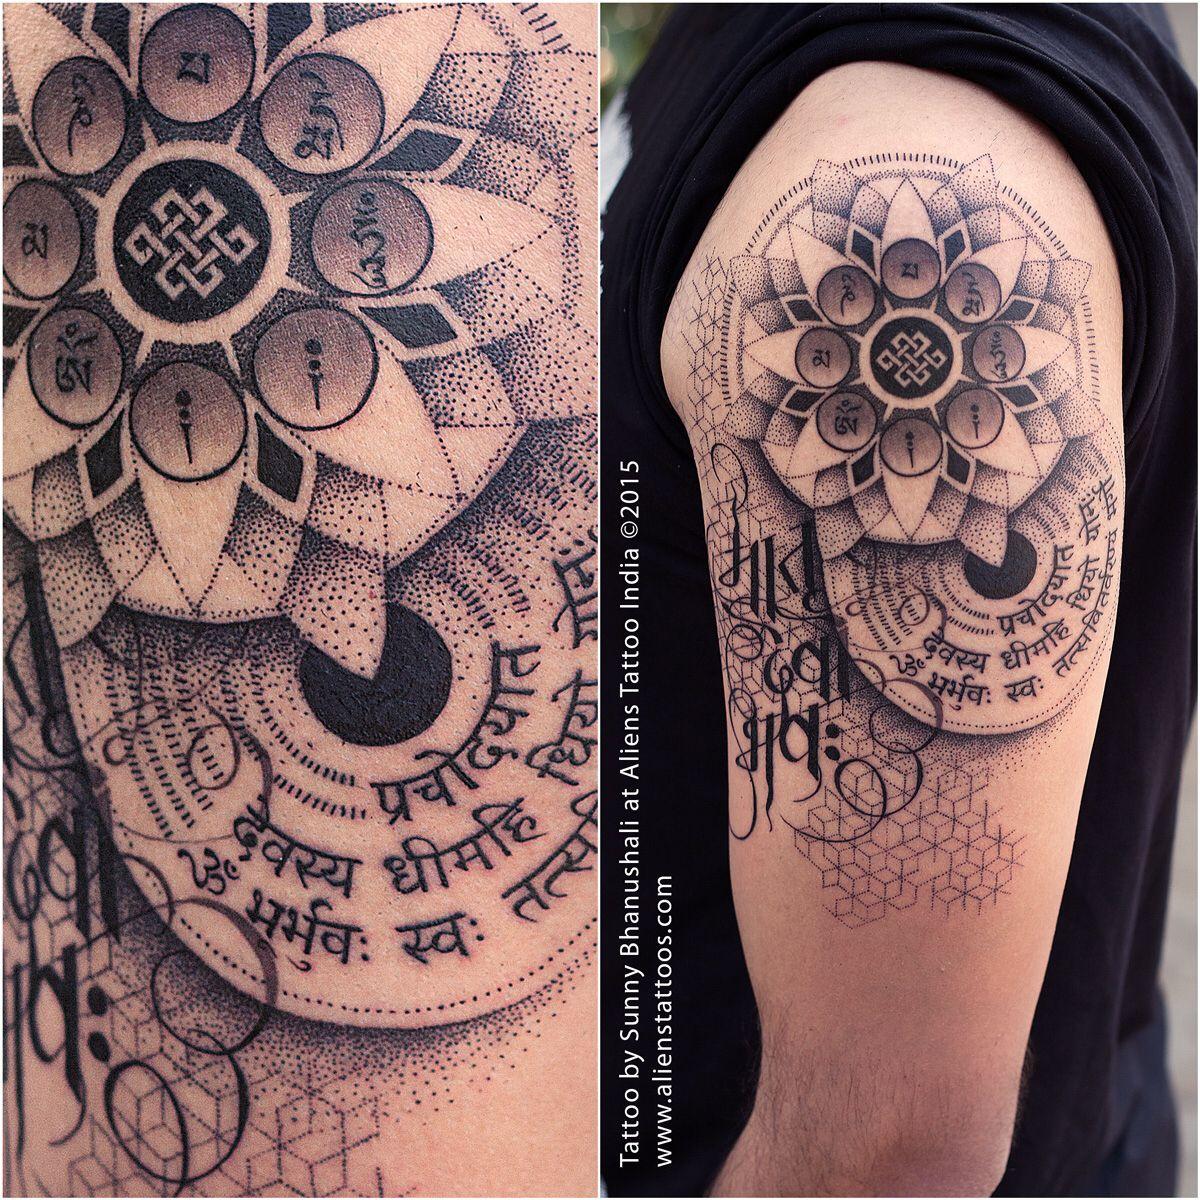 Gayatri Mantra Om Mani Padme Hum Matru Devo Bhava Client Gave